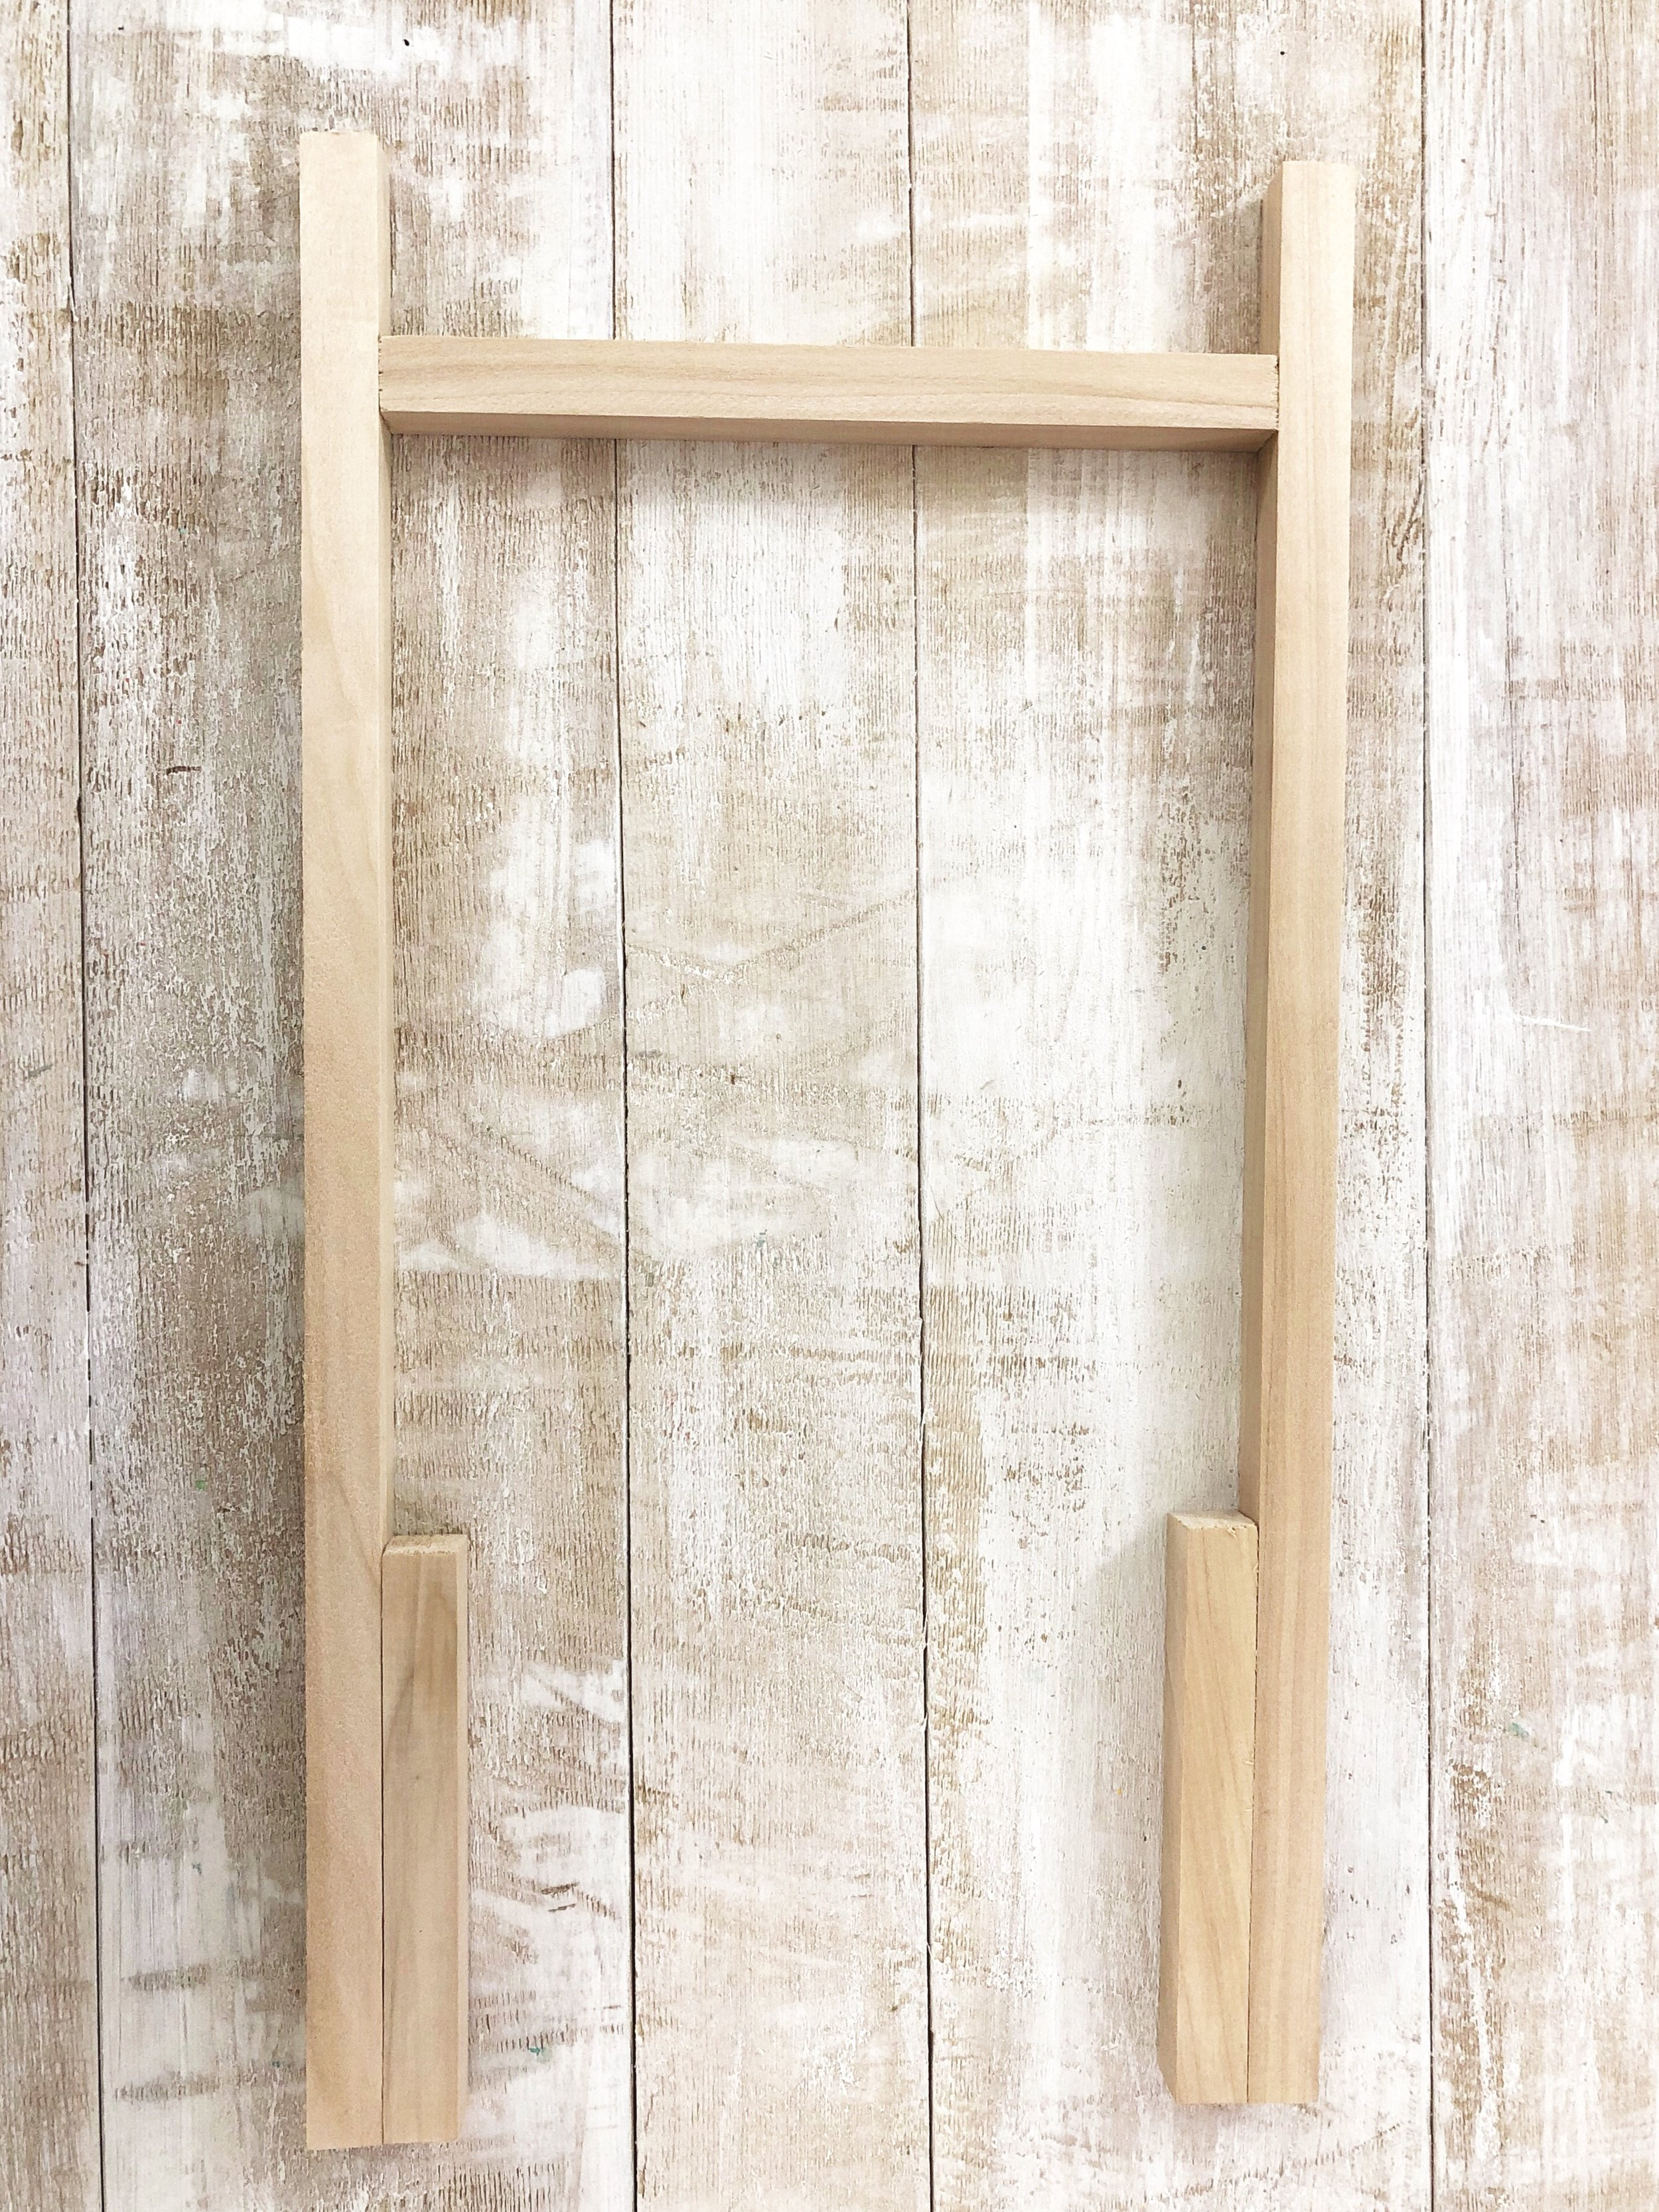 Easy DIY Mid-Century Plant Stand  #wood #woodprojects #midcentury #plantstand #houseplants #plants #greenthumb #urbanliving #apartmentliving #easy #easydiy #scrapwood #krazyglue #crazyglue #fastdryingglue #woodglue #squaredowels #gotwood #homedecor #diyhomedecor #indooorgarden #plantdads #woodcraft #miterbox #saw #quickcraft #craftylumberjacks #midcenturymodern #midcenturyhomedecor